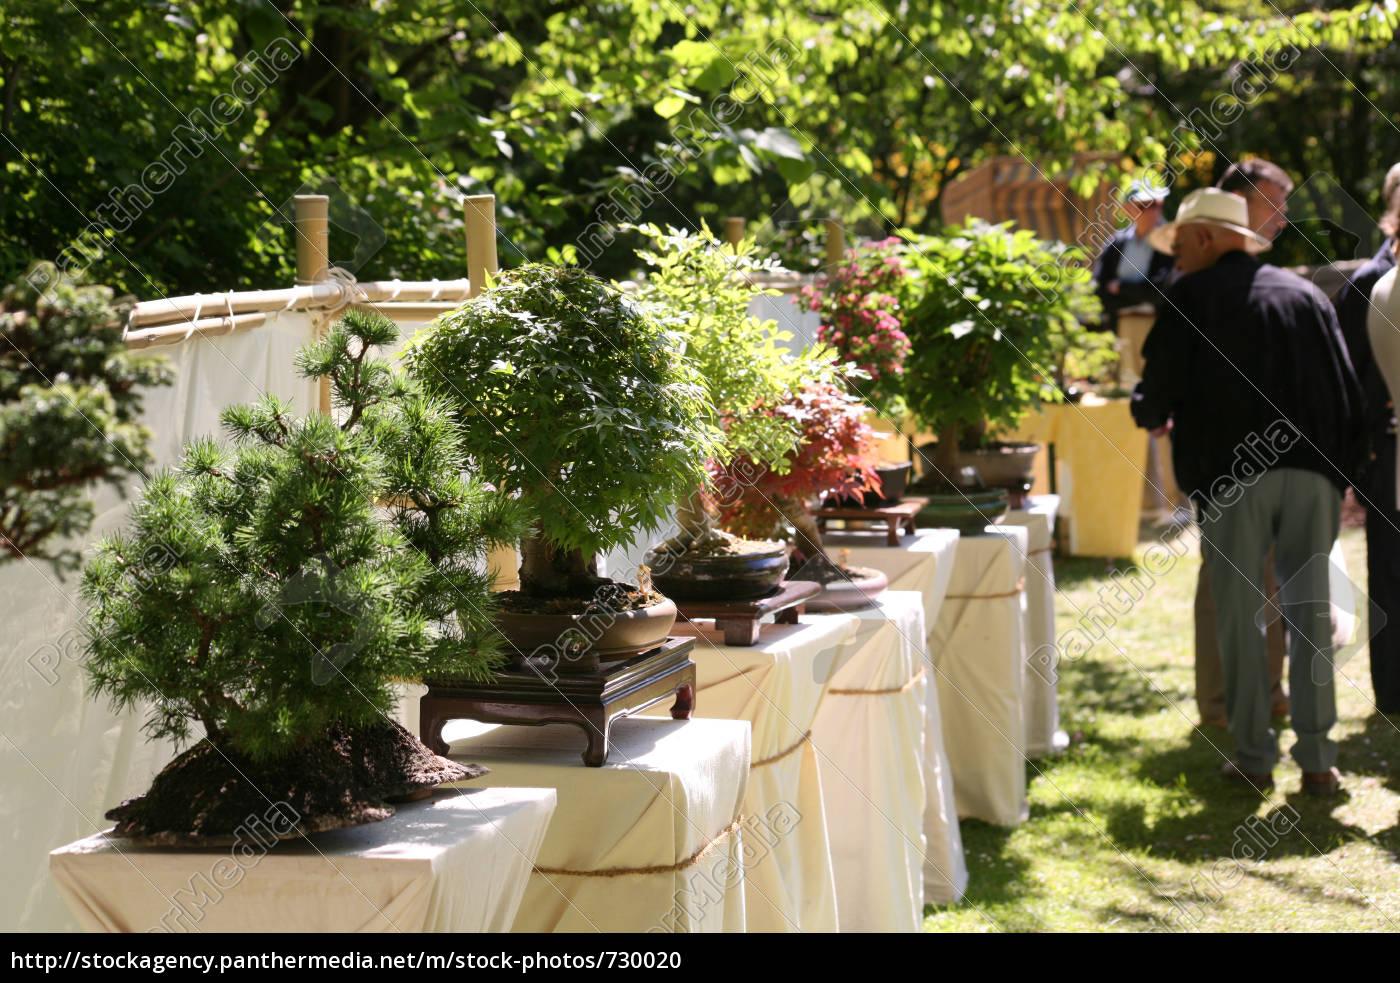 bonsai, exhibition - 730020